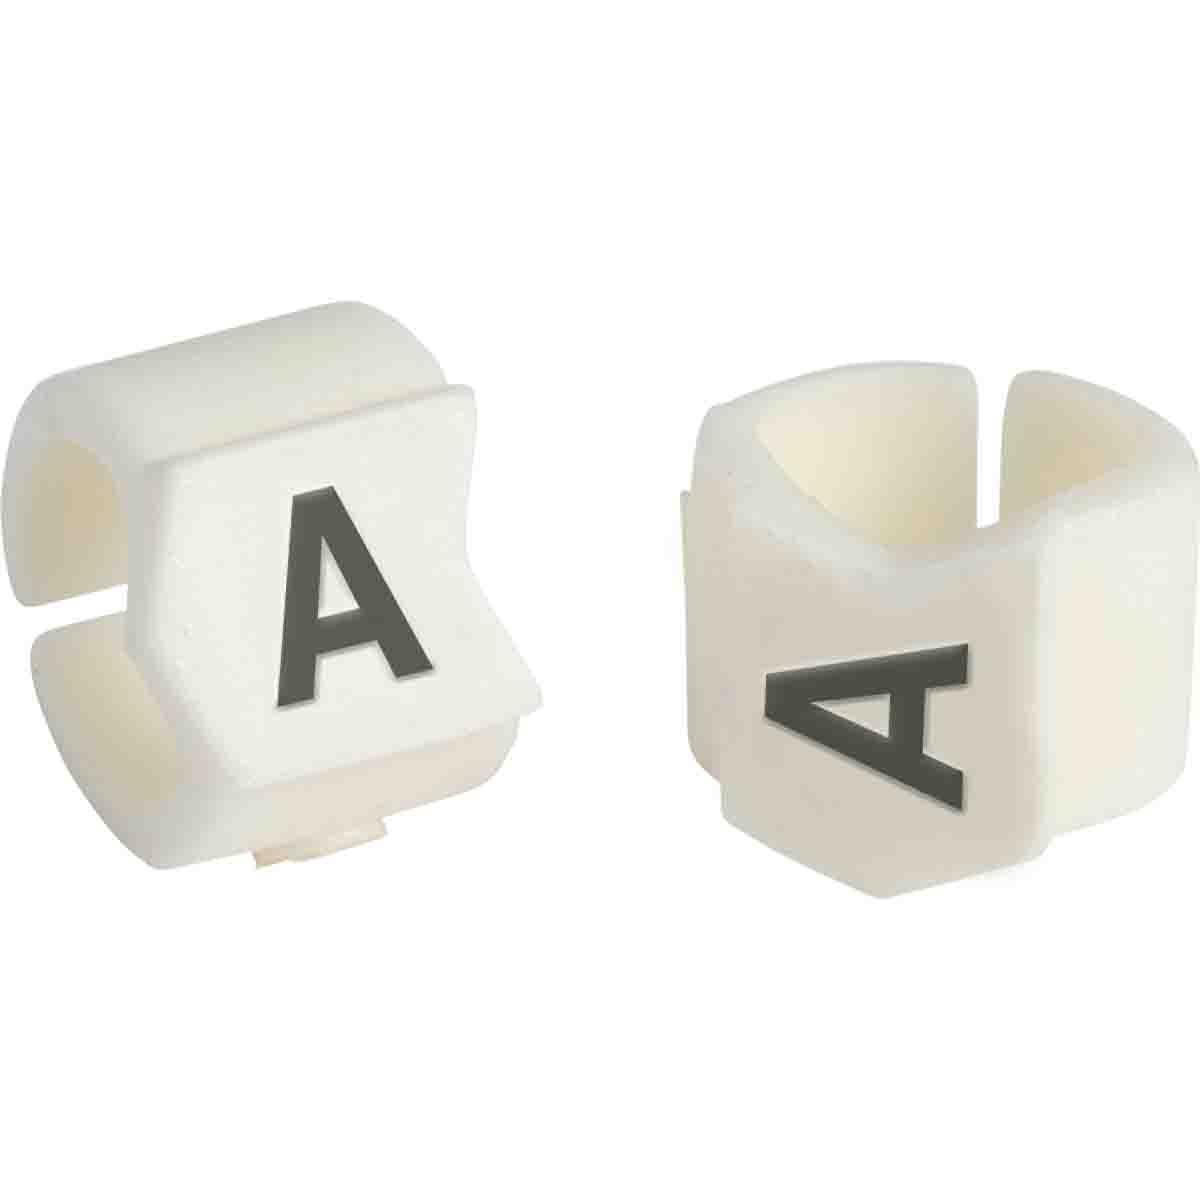 Brady® Clip-Sleeve™ SCN23-1 SCN Pre-Printed Wire Marker, 0.236 to 0.299 in Wire, 1 Legend, Black on White Legend, White Marker, Nylon